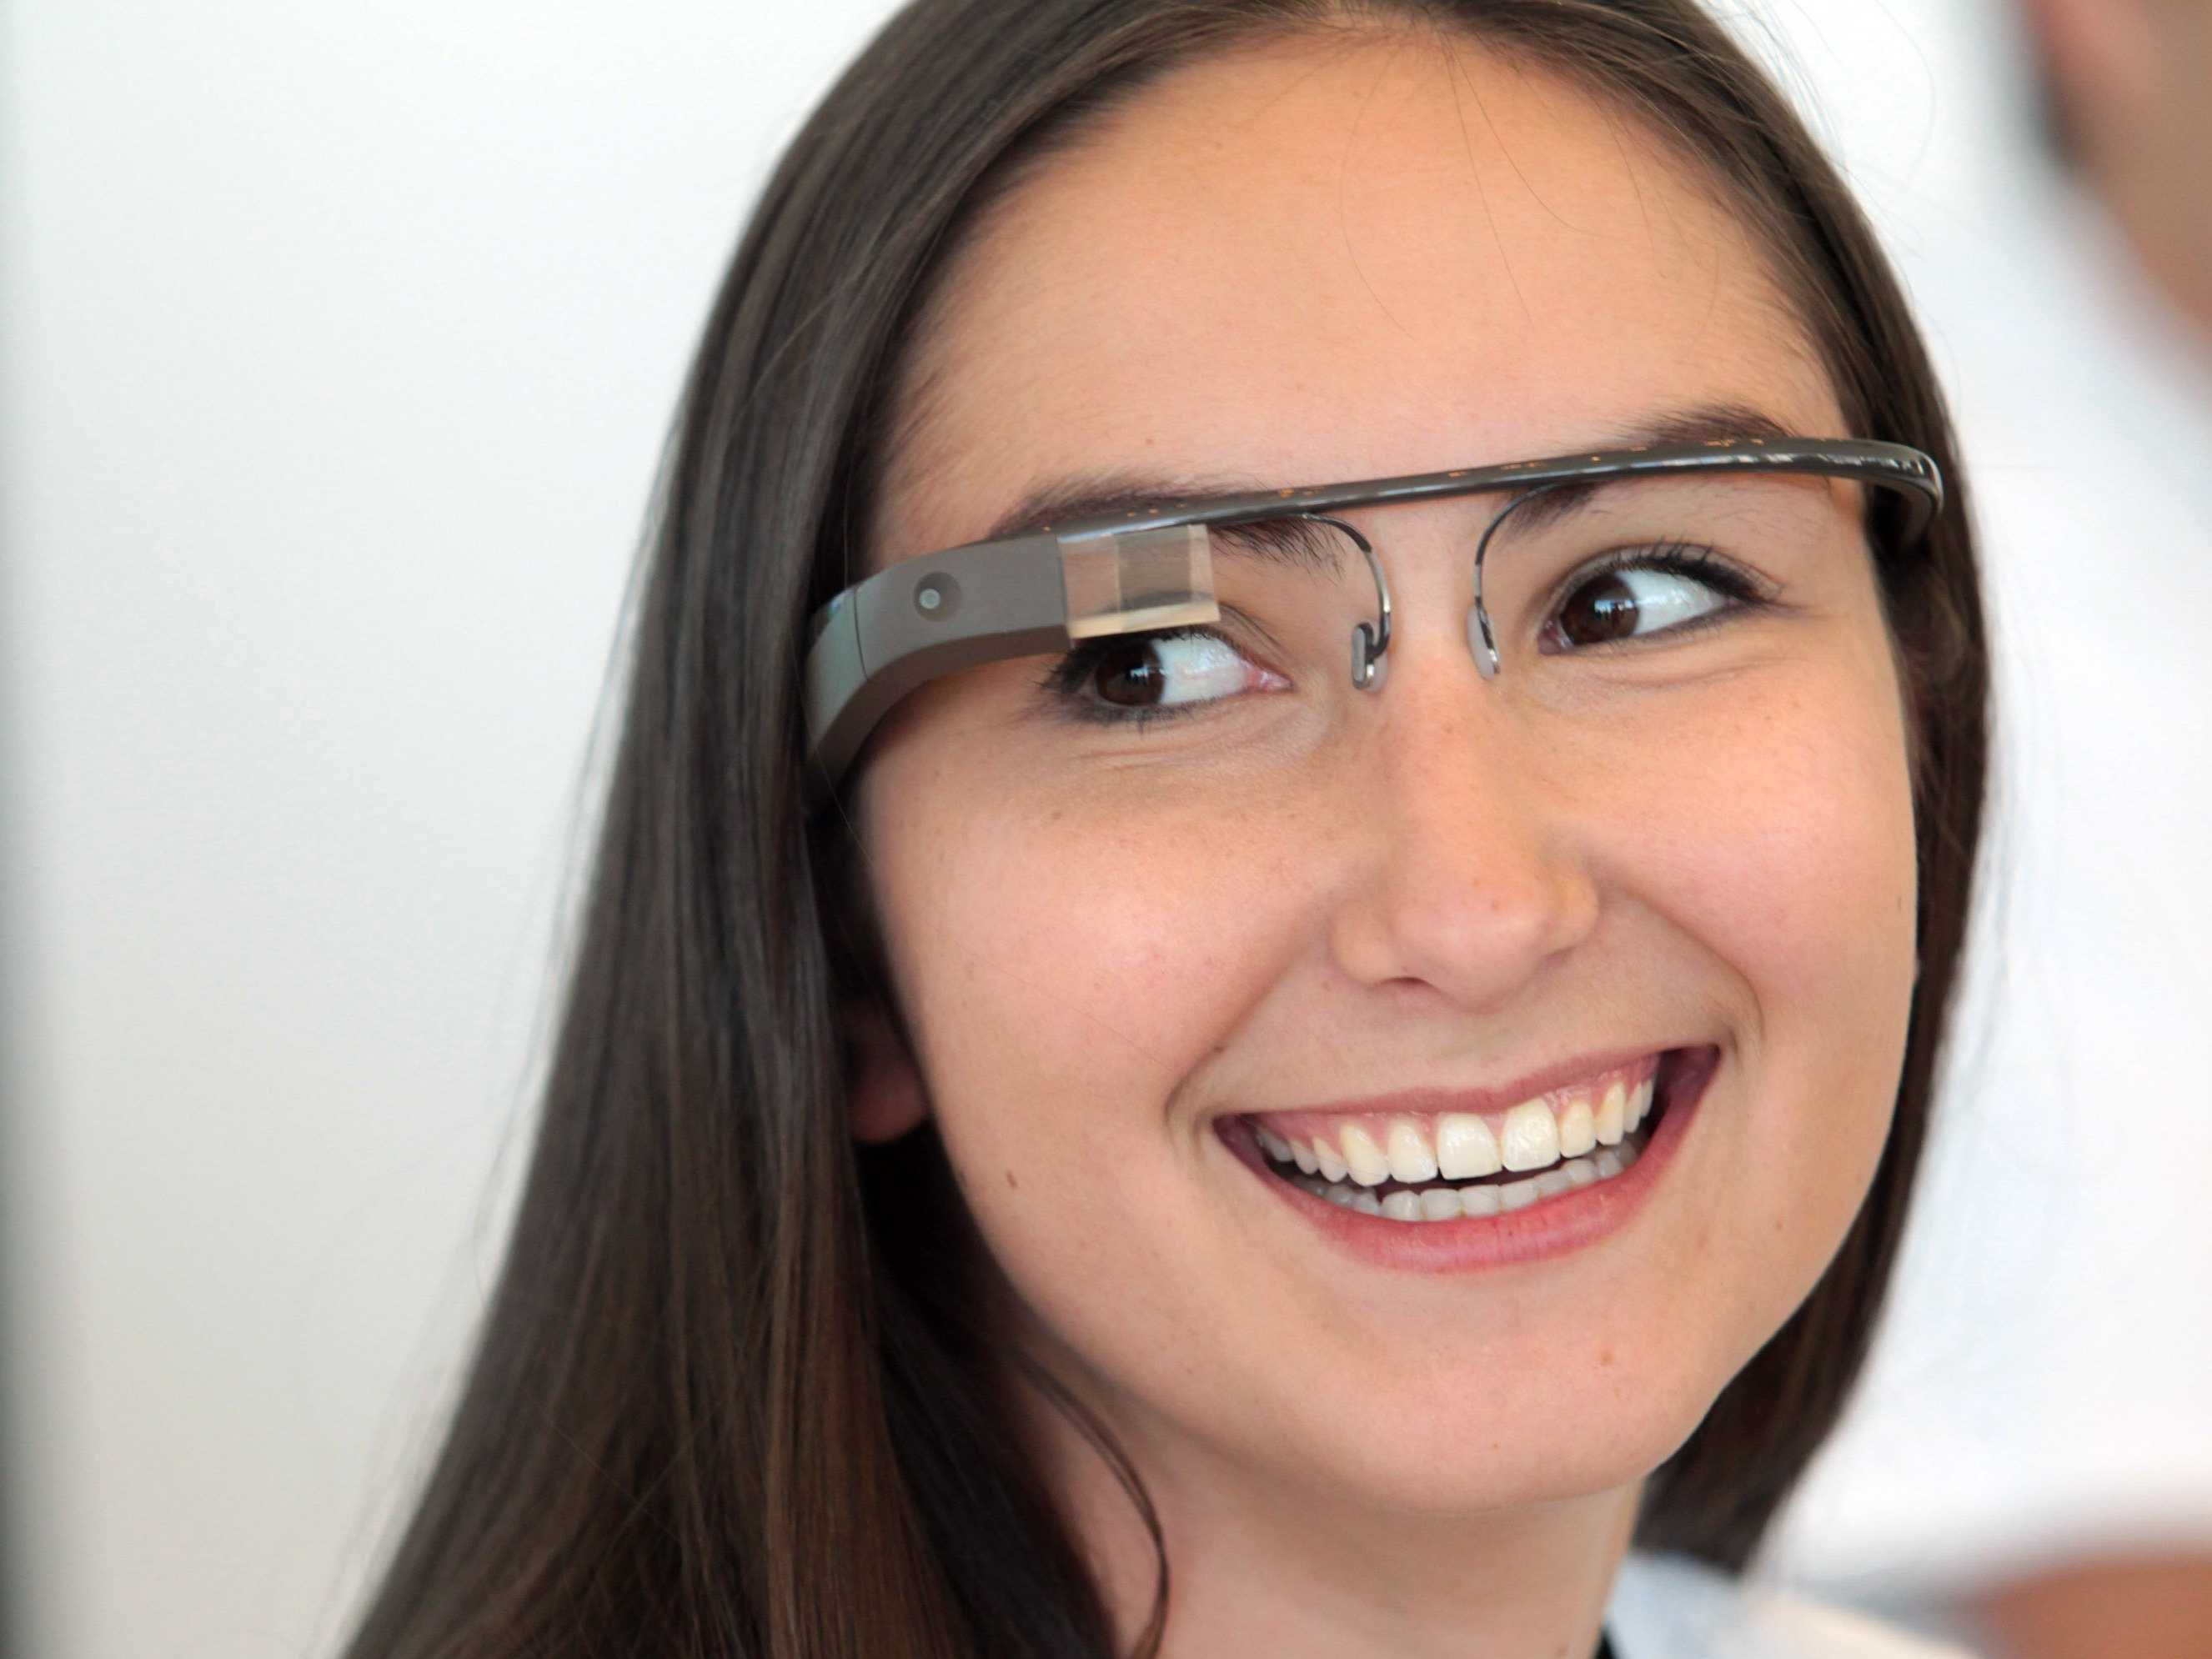 Google Glass o saranno il prossimo iPhone o il prossimo Newton.